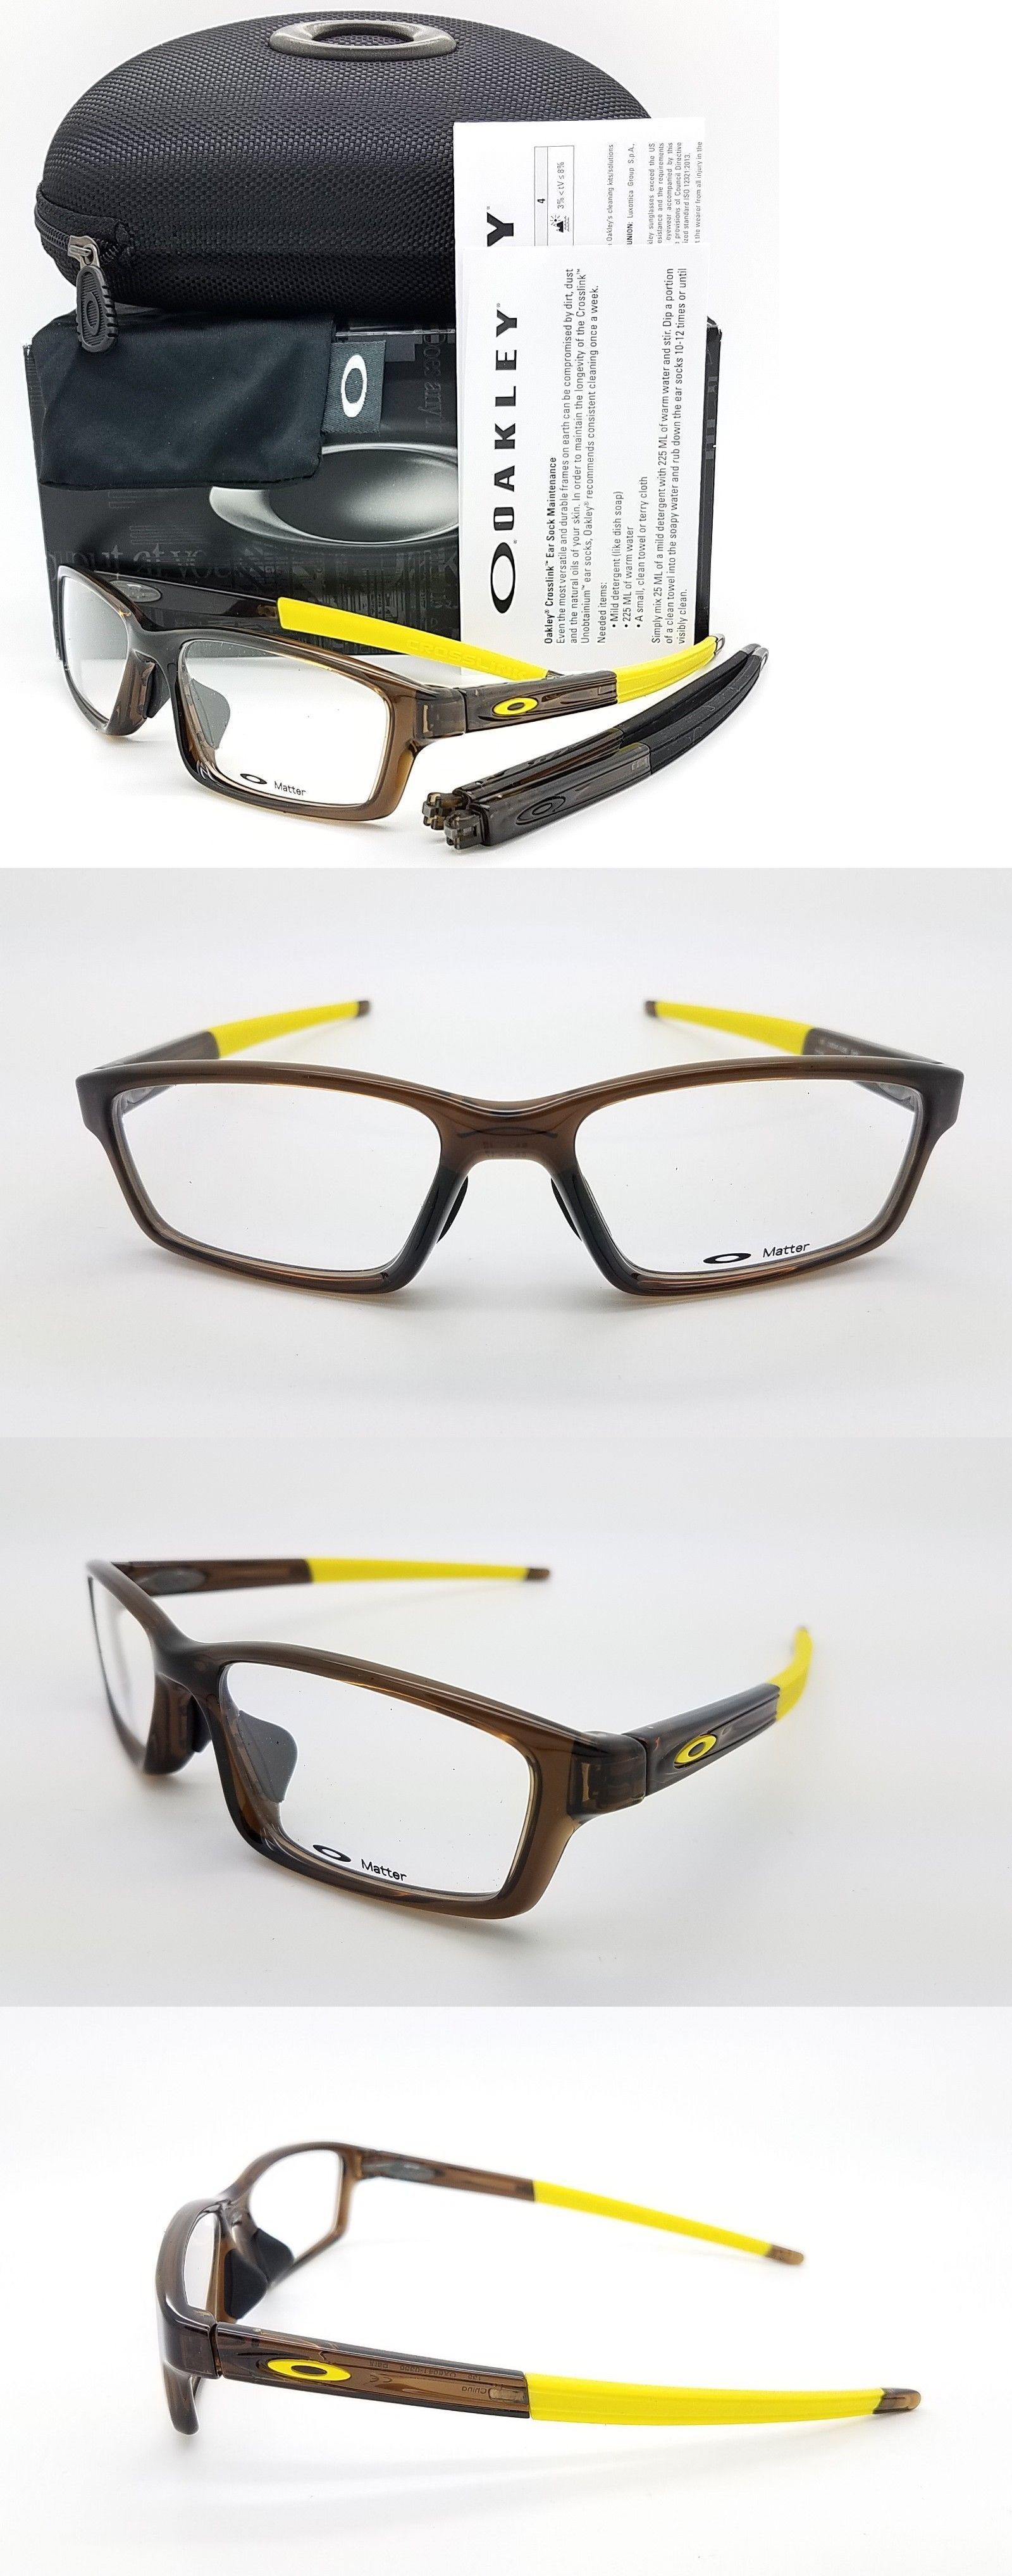 d9c071d0902c Eyeglass Frames 180957  New Oakley Crosslink Pitch Rx Asian Fit Frame Bark  Ox8041-0356 Brown 56Mm 8041 -  BUY IT NOW ONLY   75.55 on  eBay  eyeglass   frames ...